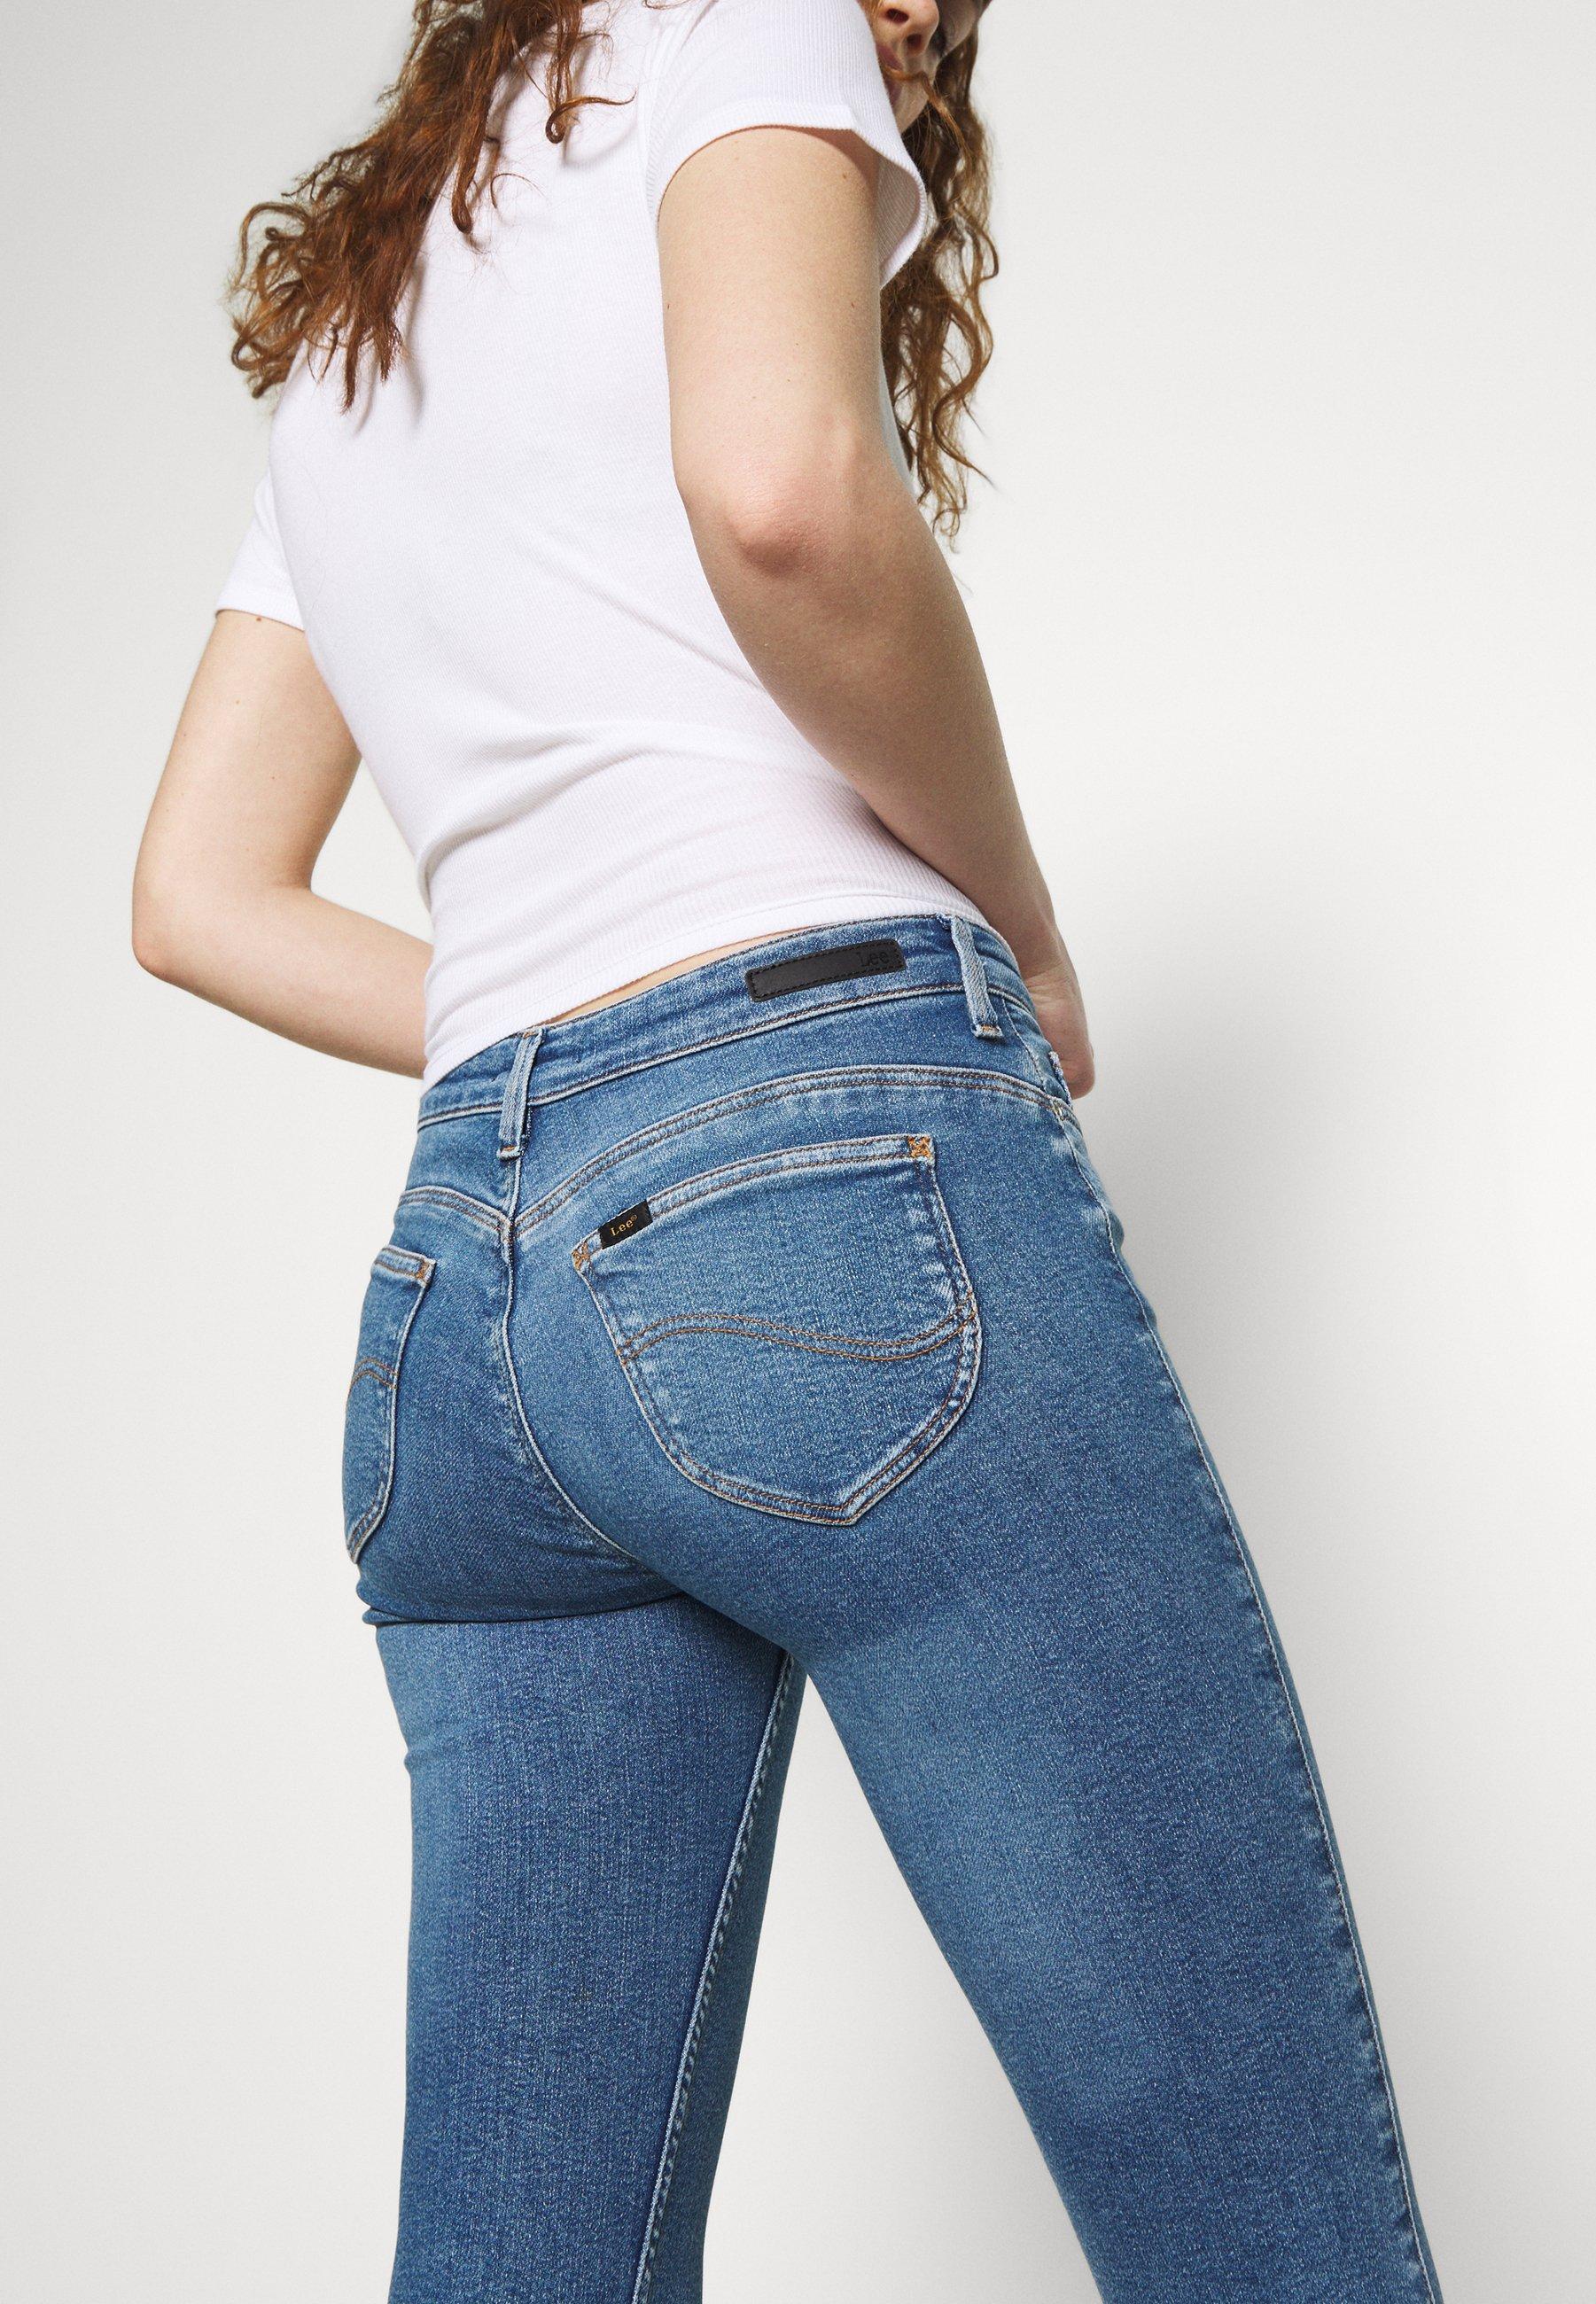 Lee Scarlett Body Optix - Jeans Skinny Fit Alabama Dawn iQUUx